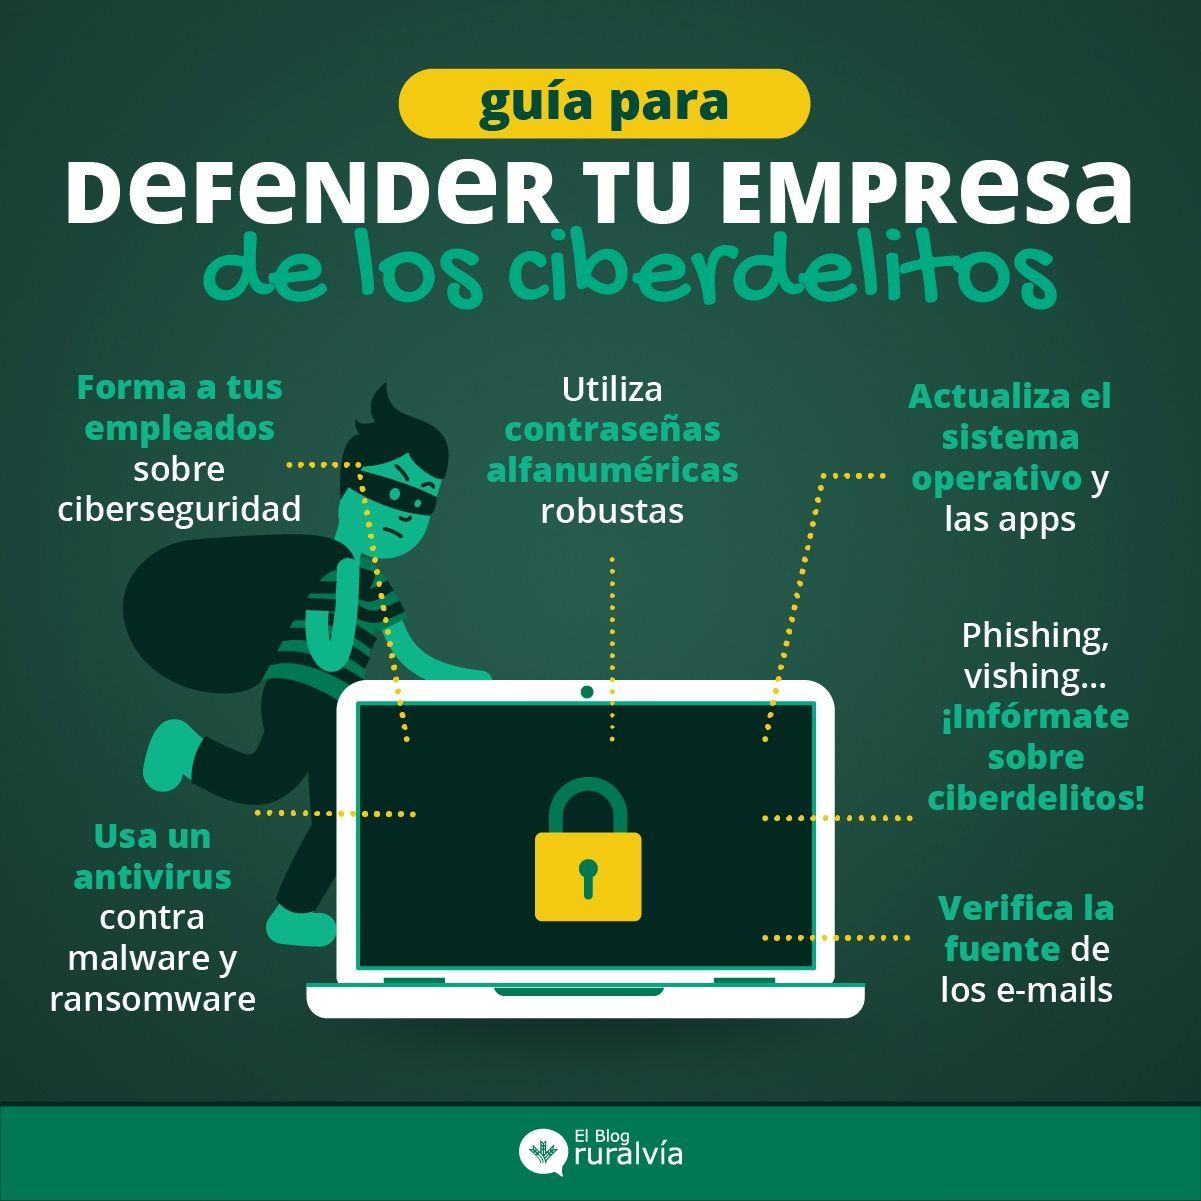 protege-empresa-ciberdelitos